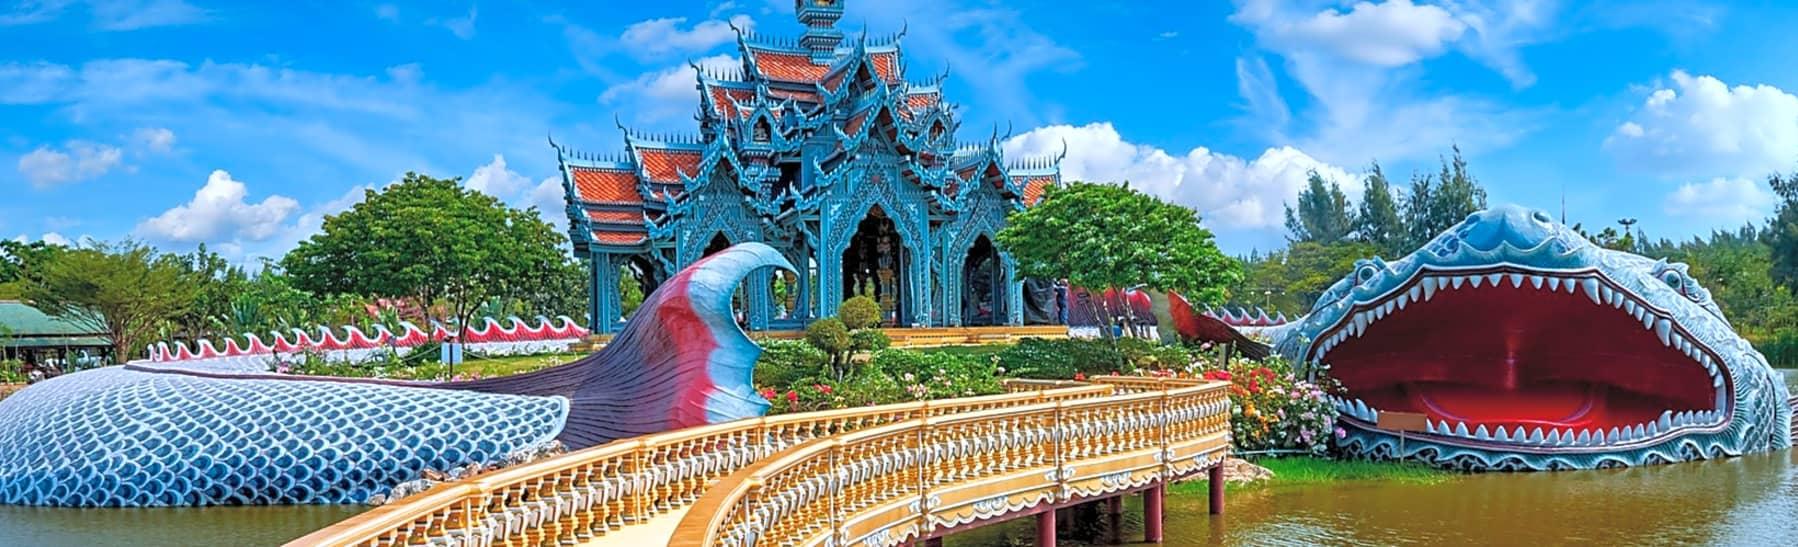 The Trip Guru 感受曼谷行程9折預訂優惠碼:第10張圖片